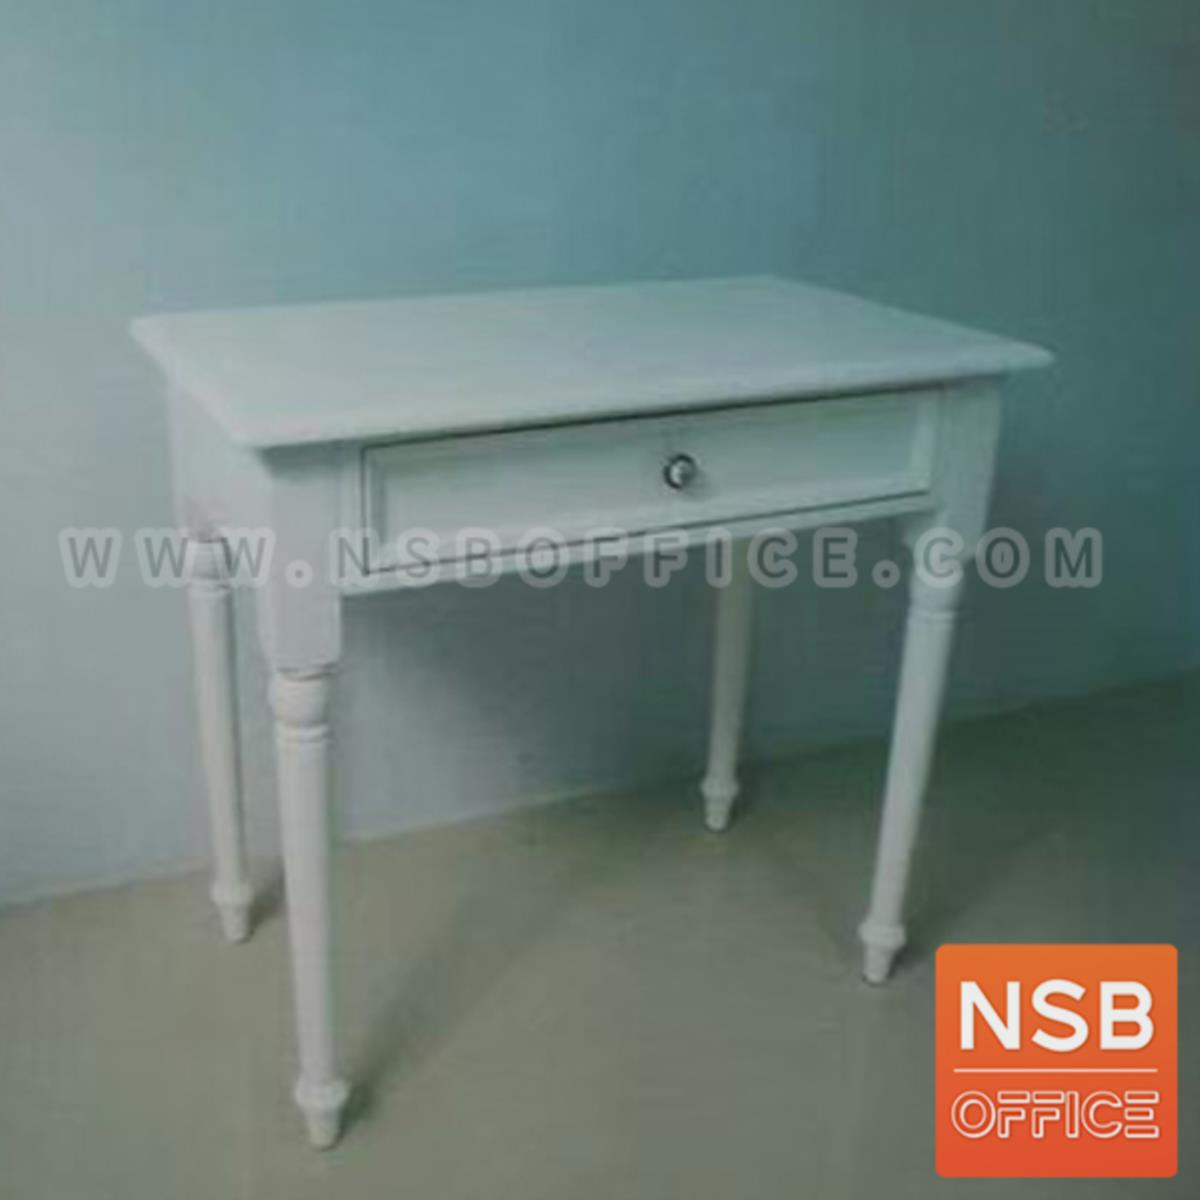 G20A020:โต๊ะเหลี่ยมไม้ยางพารา 1 ลิ้นชัก รุ่น Darren (ดาร์เรน) ขนาด 80W*48D*75H cm.